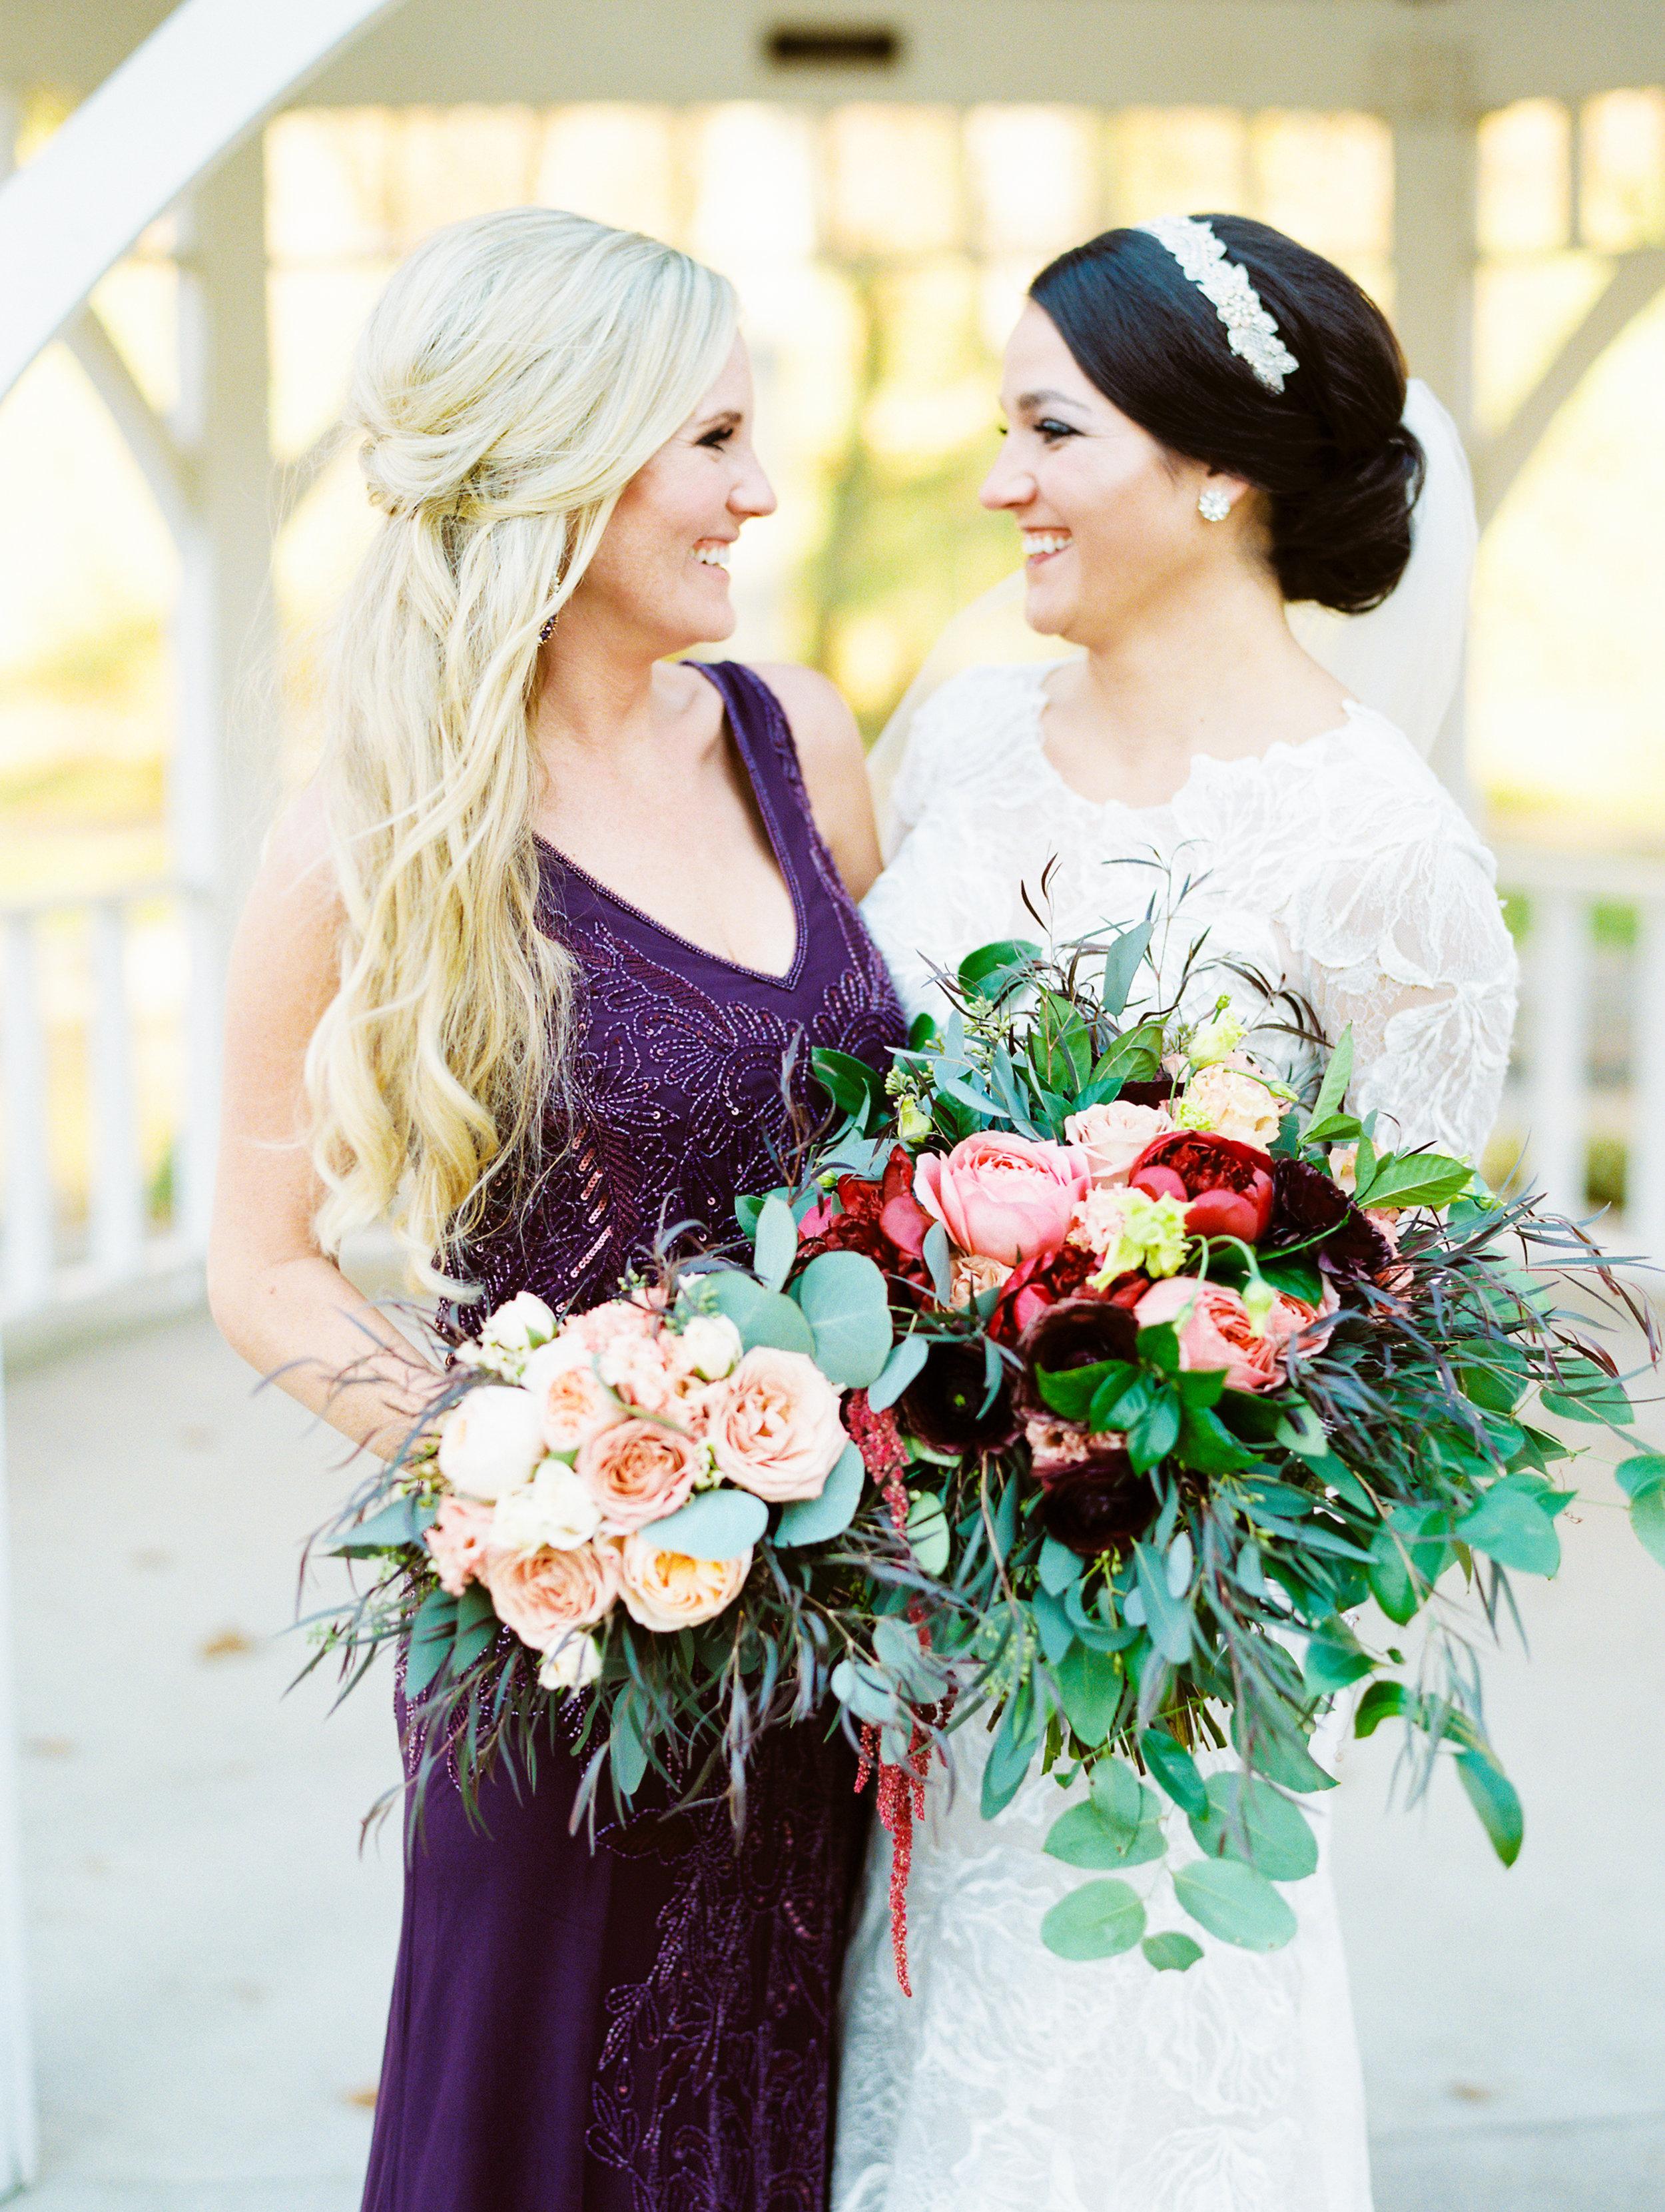 Vogelzang+Wedding+Bridesmaids-35.jpg